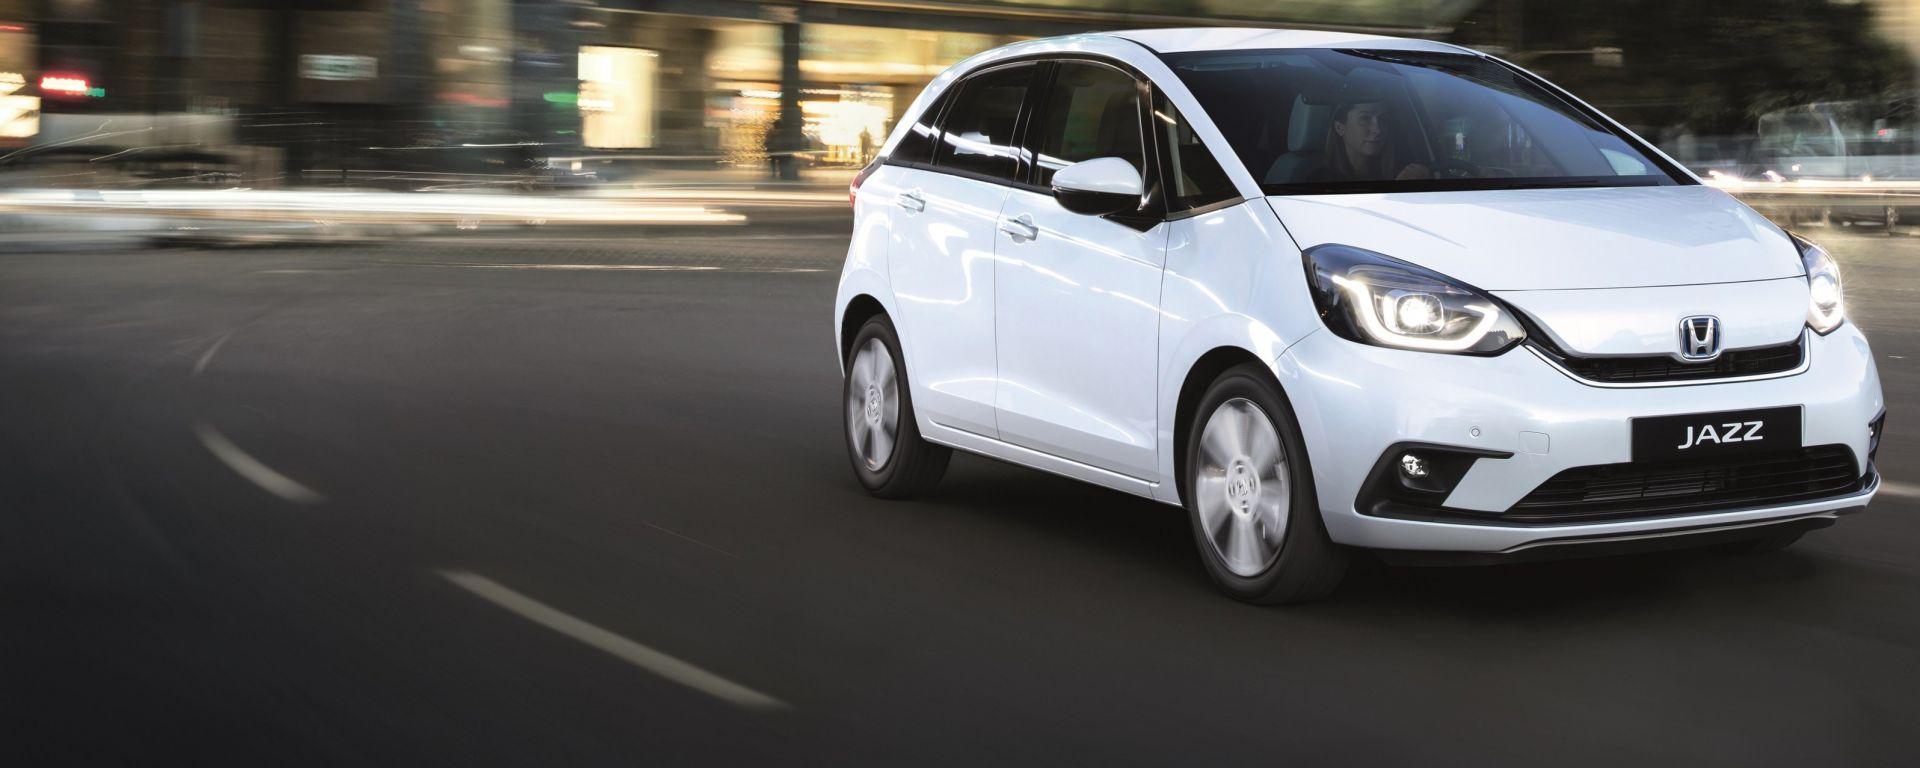 Nuova Honda Jazz 2020 in vendita da giugno. Ecco i prezzi